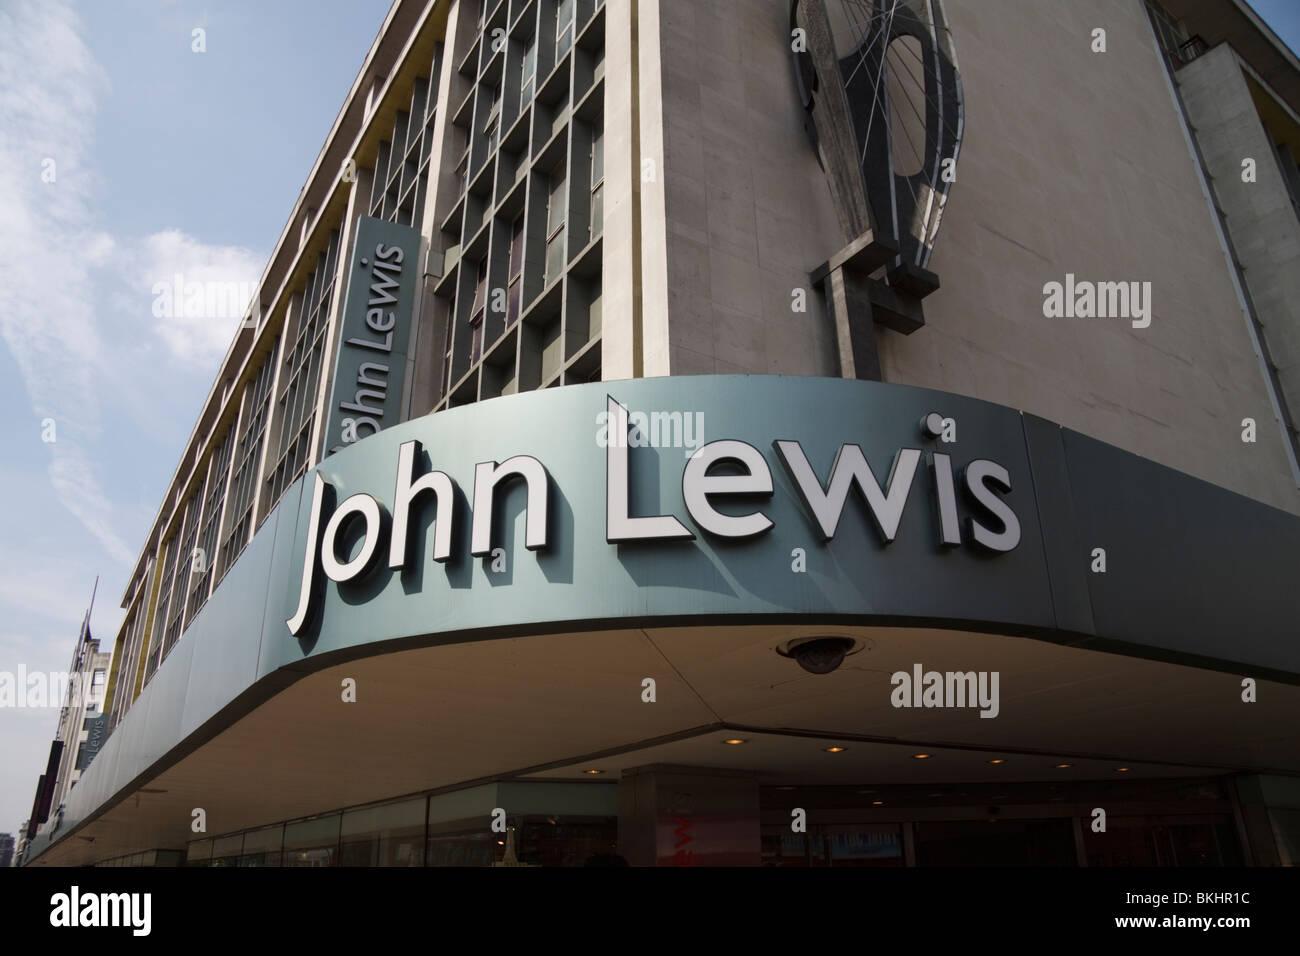 John Lewis department store/shop, Oxford Street, London, England, UK - Stock Image